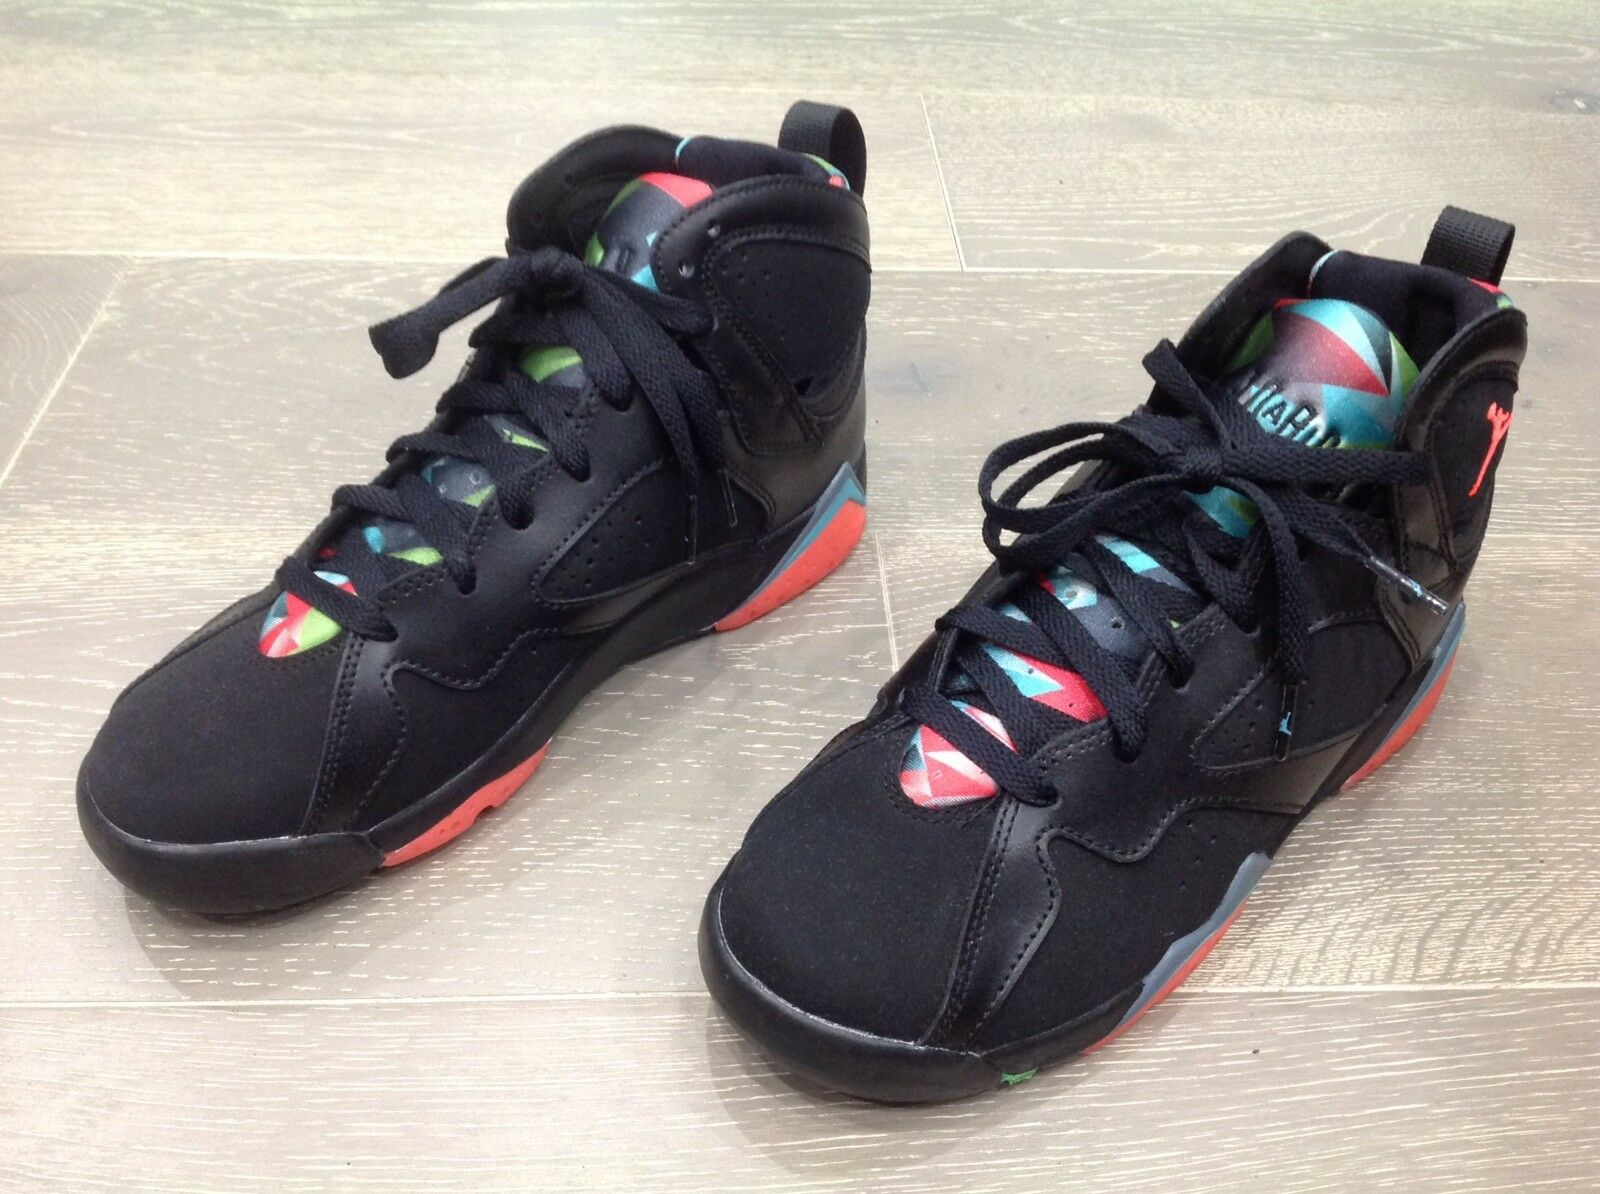 Air Jordan 7 Retro VII Marvin The Martian Size 7 Nero 705350 007